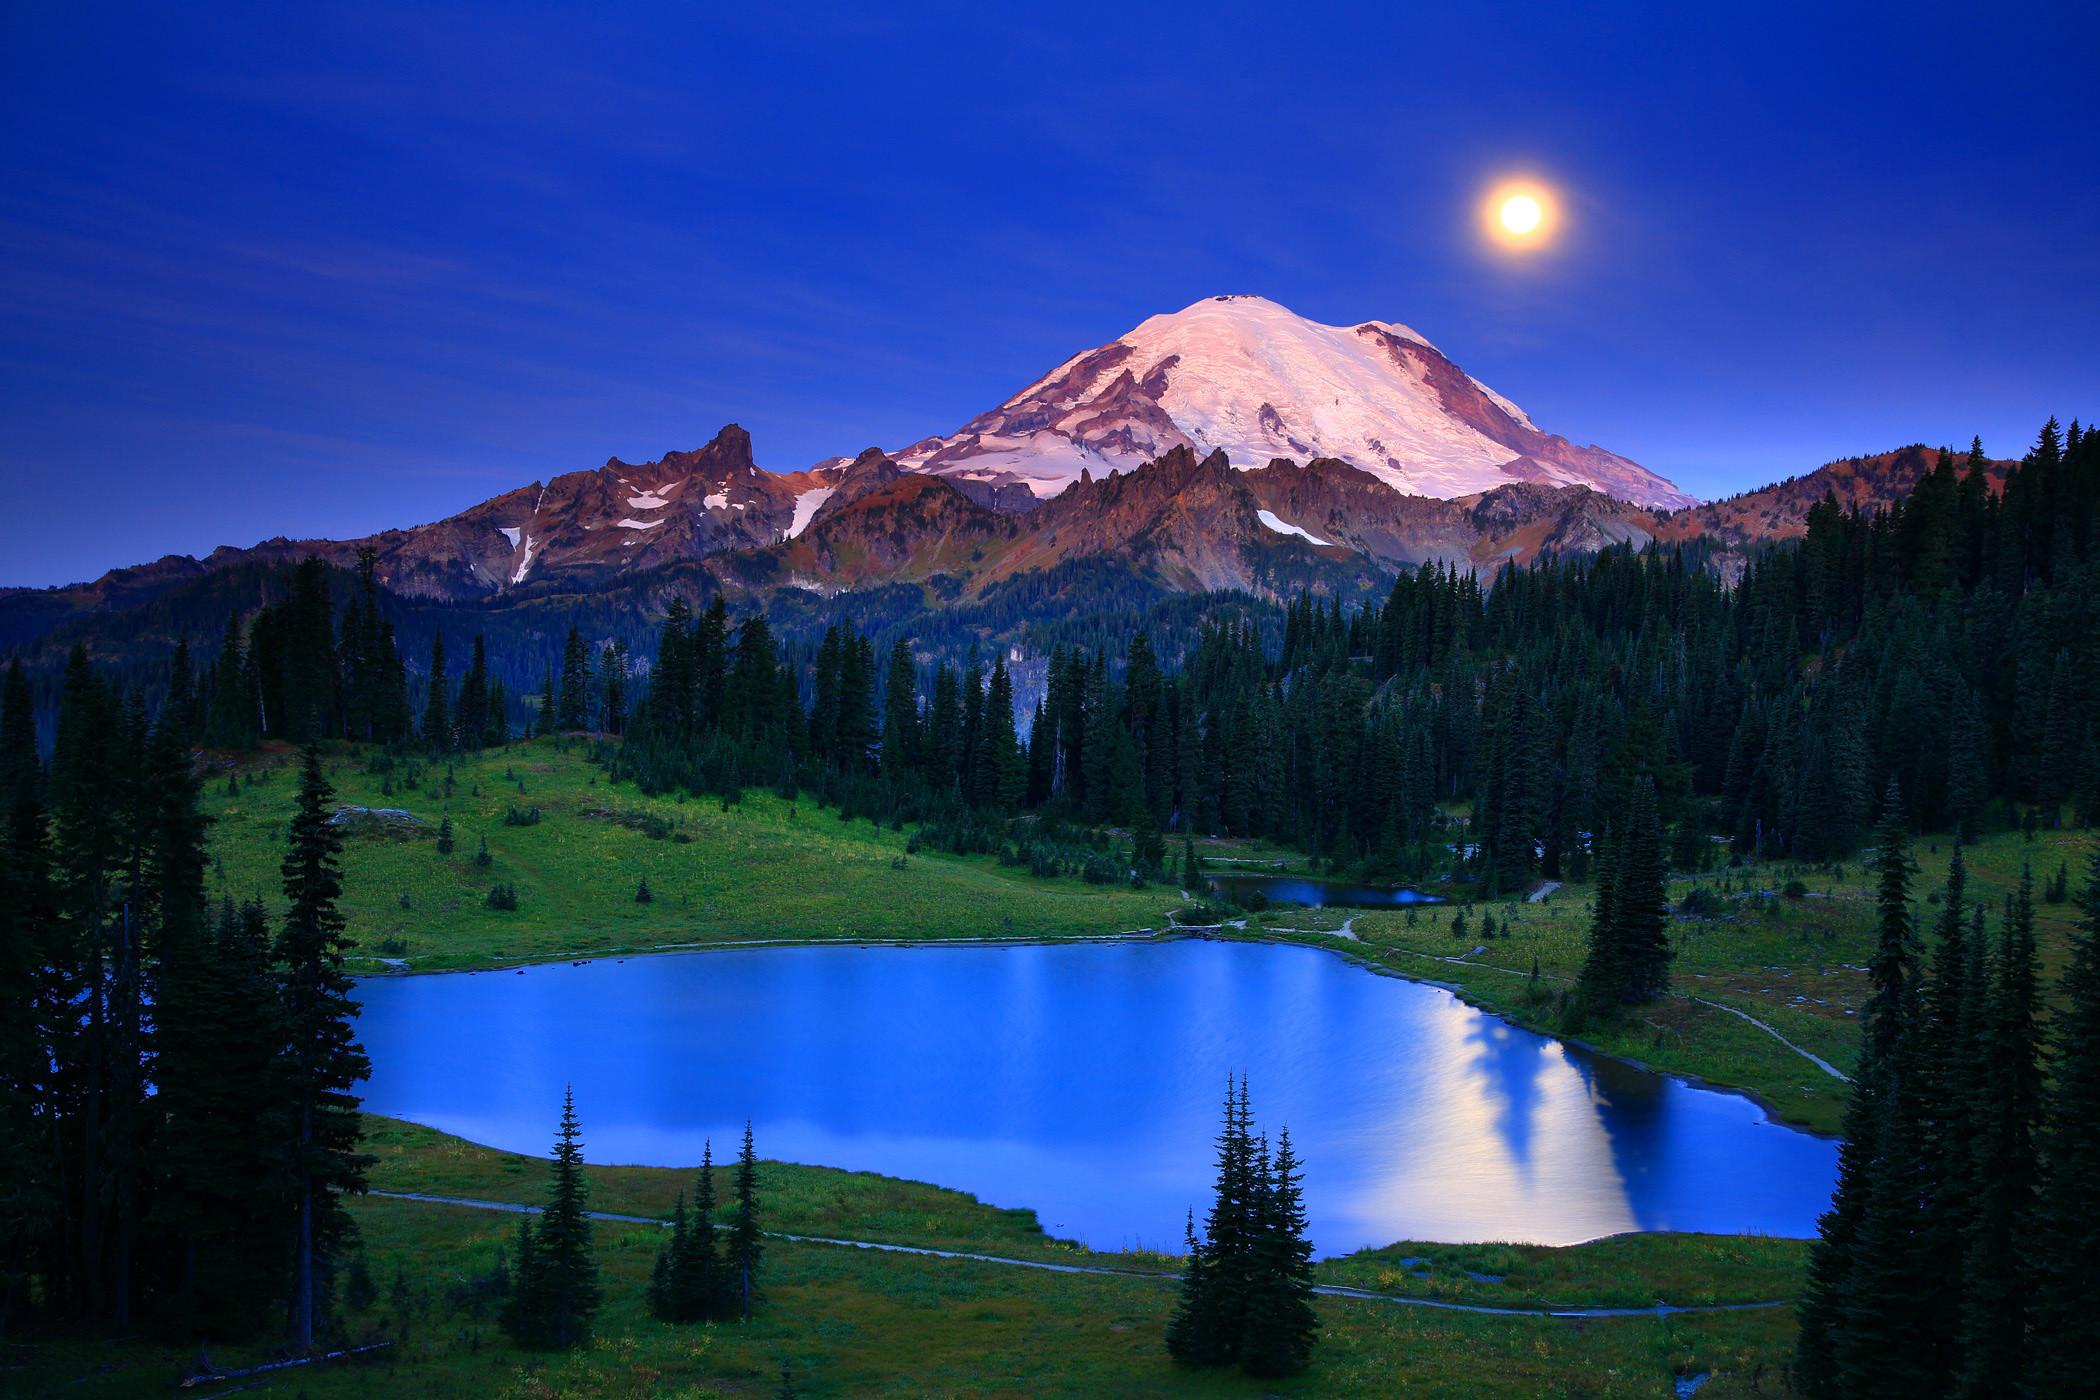 Washington lake mountains landscape moon moonlight night reflection  wallpaper     153396   WallpaperUP